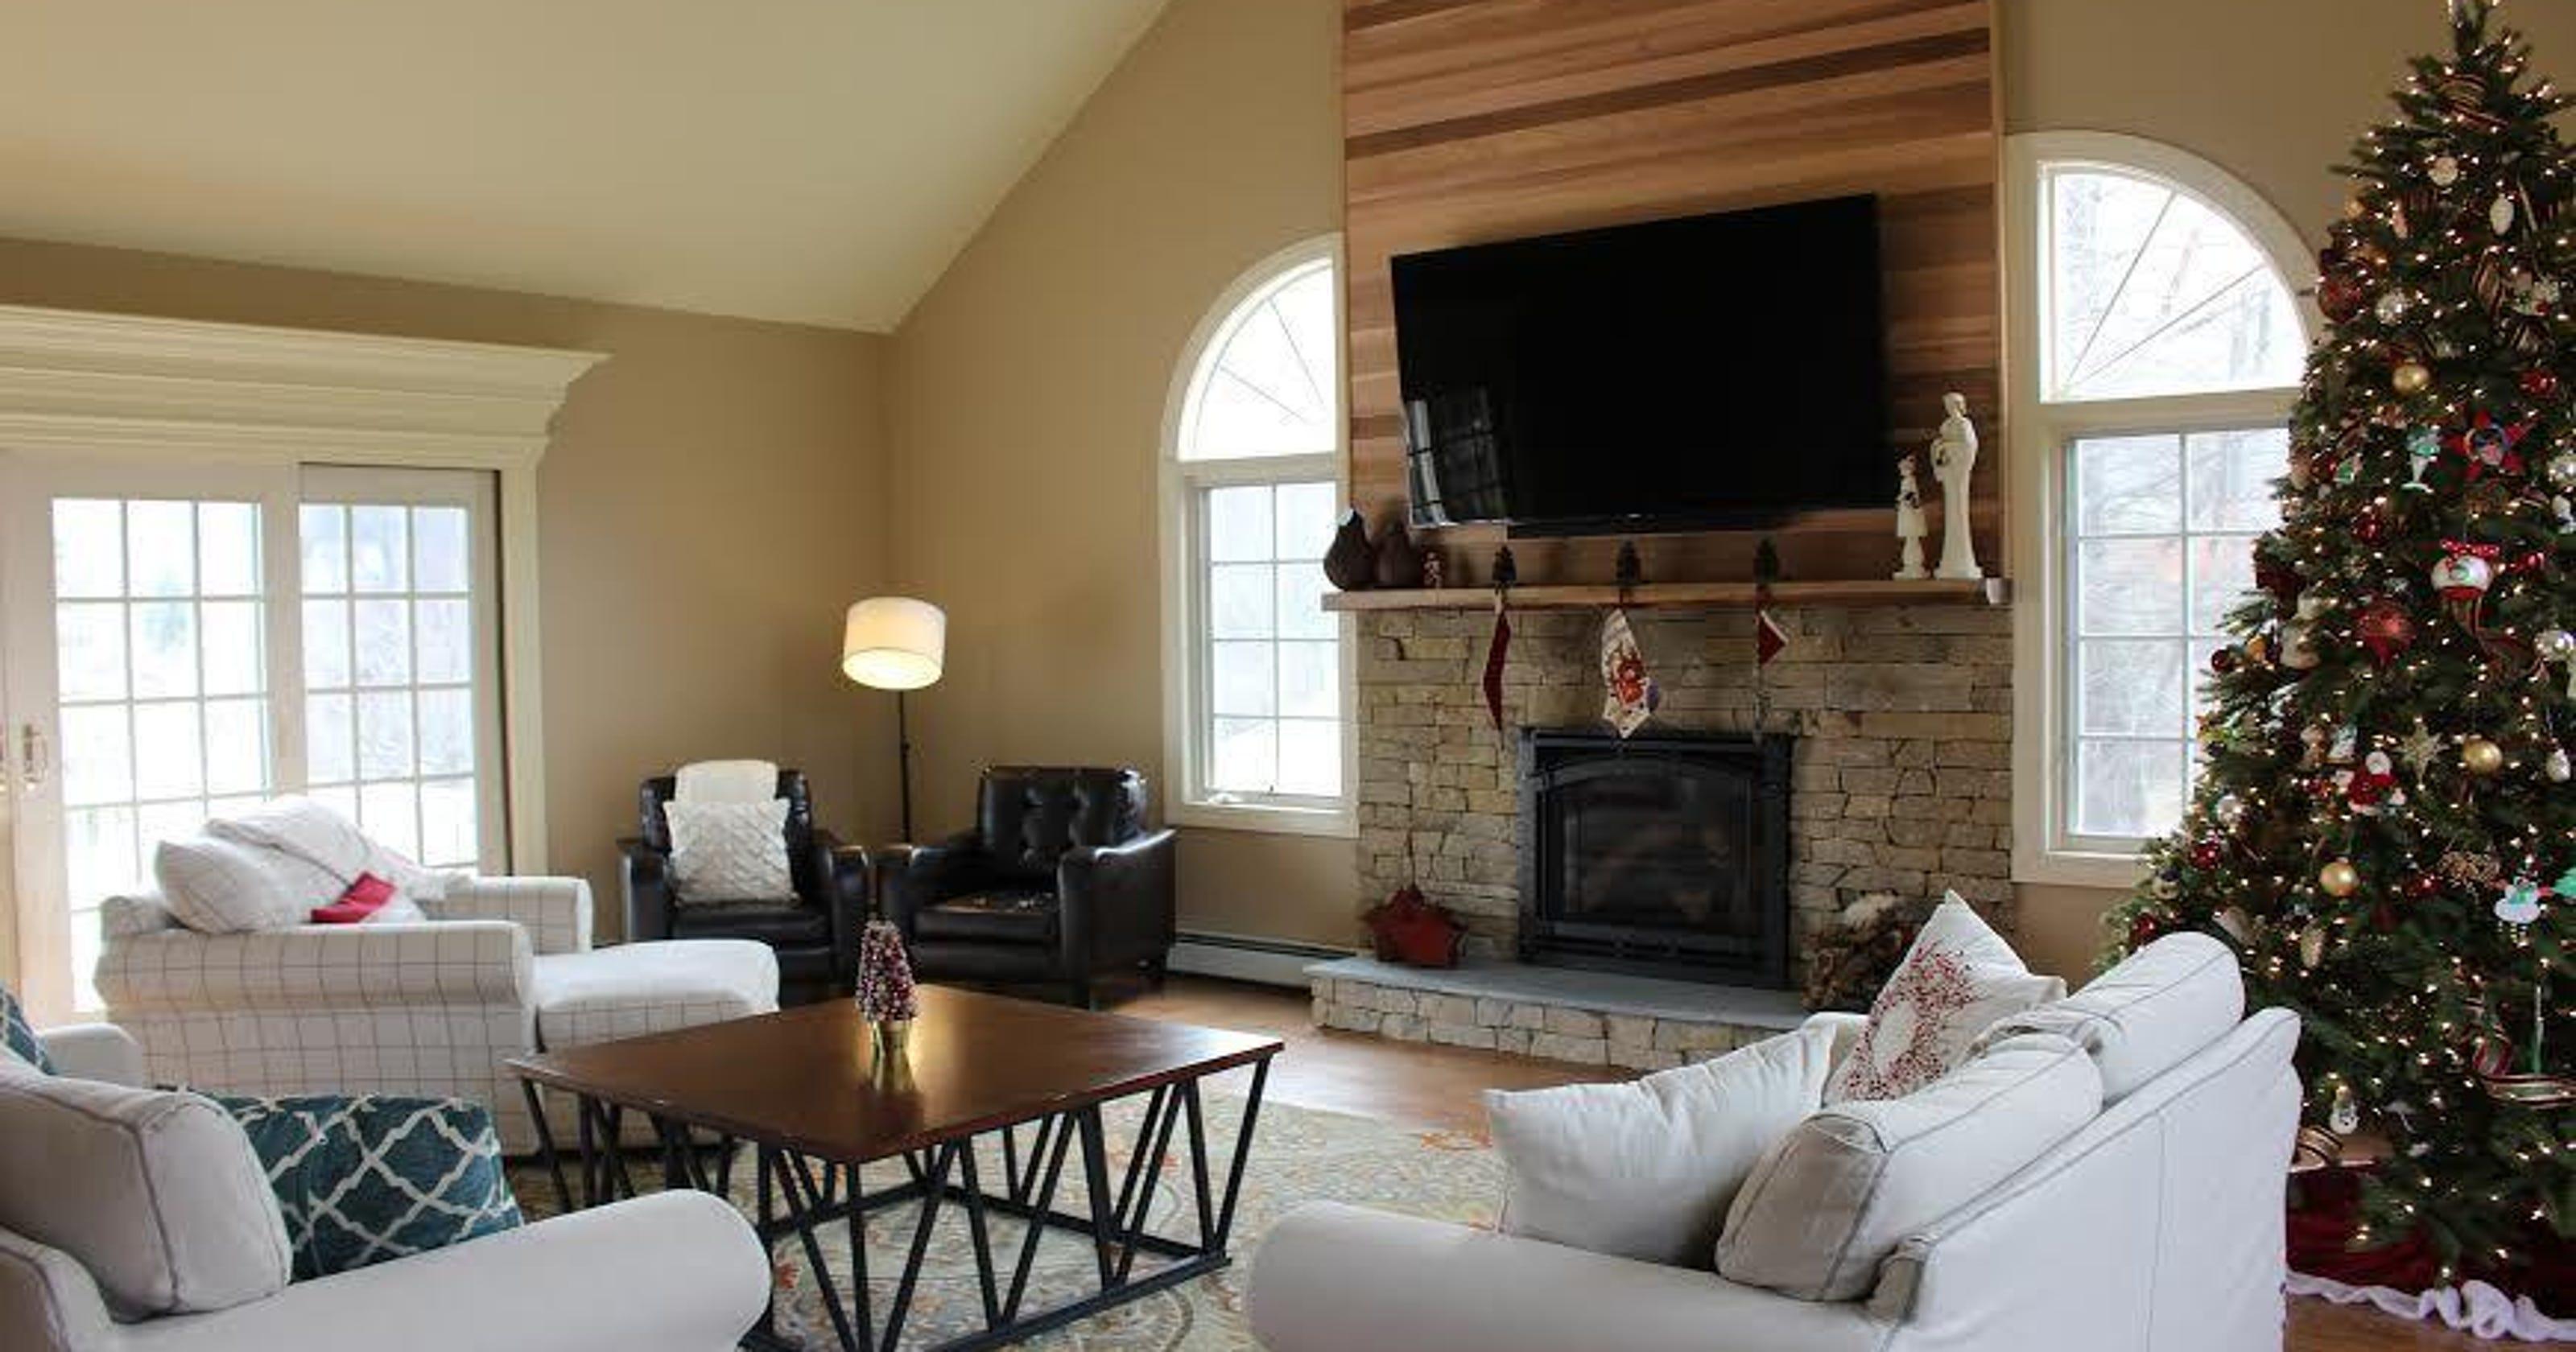 Online home design service connects clients pros